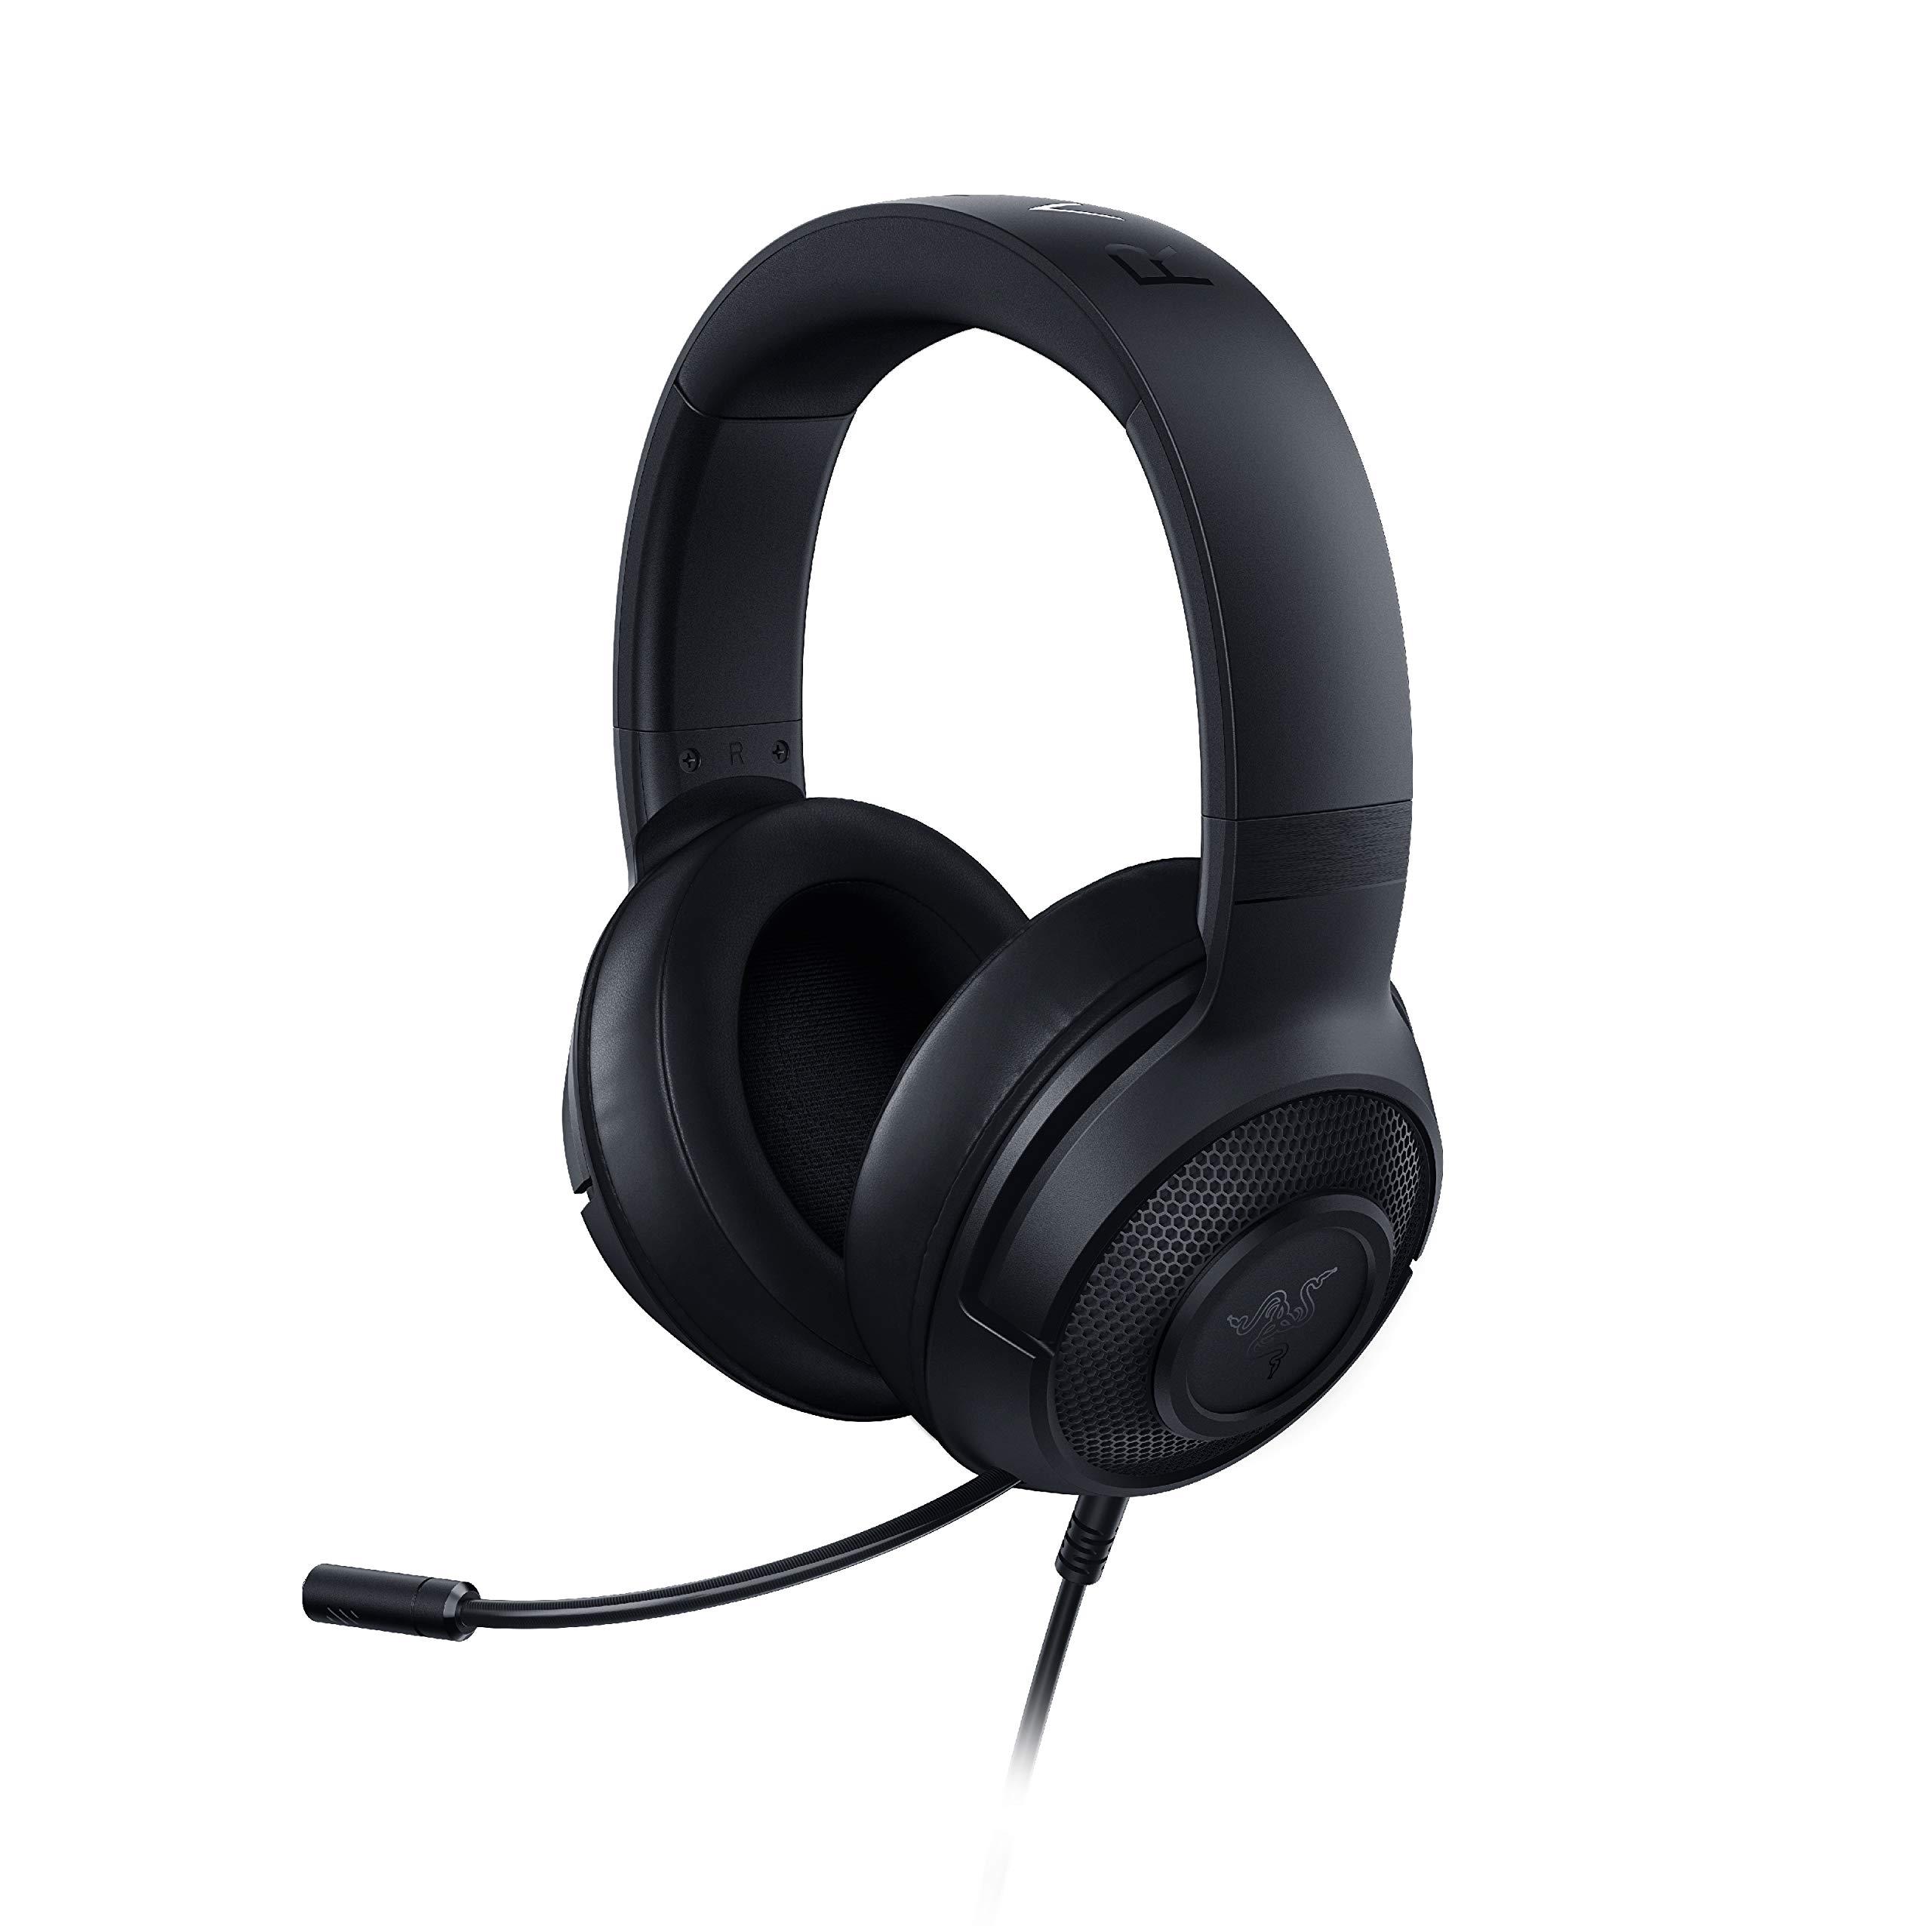 Razer Kraken X Ultralight Gaming Headset: 7.1 Surround Sound Capable - Lightweight Frame - Bendable Cardioid Microphone - For PC, Xbox, PS4, Nintendo Switch - Black by Razer